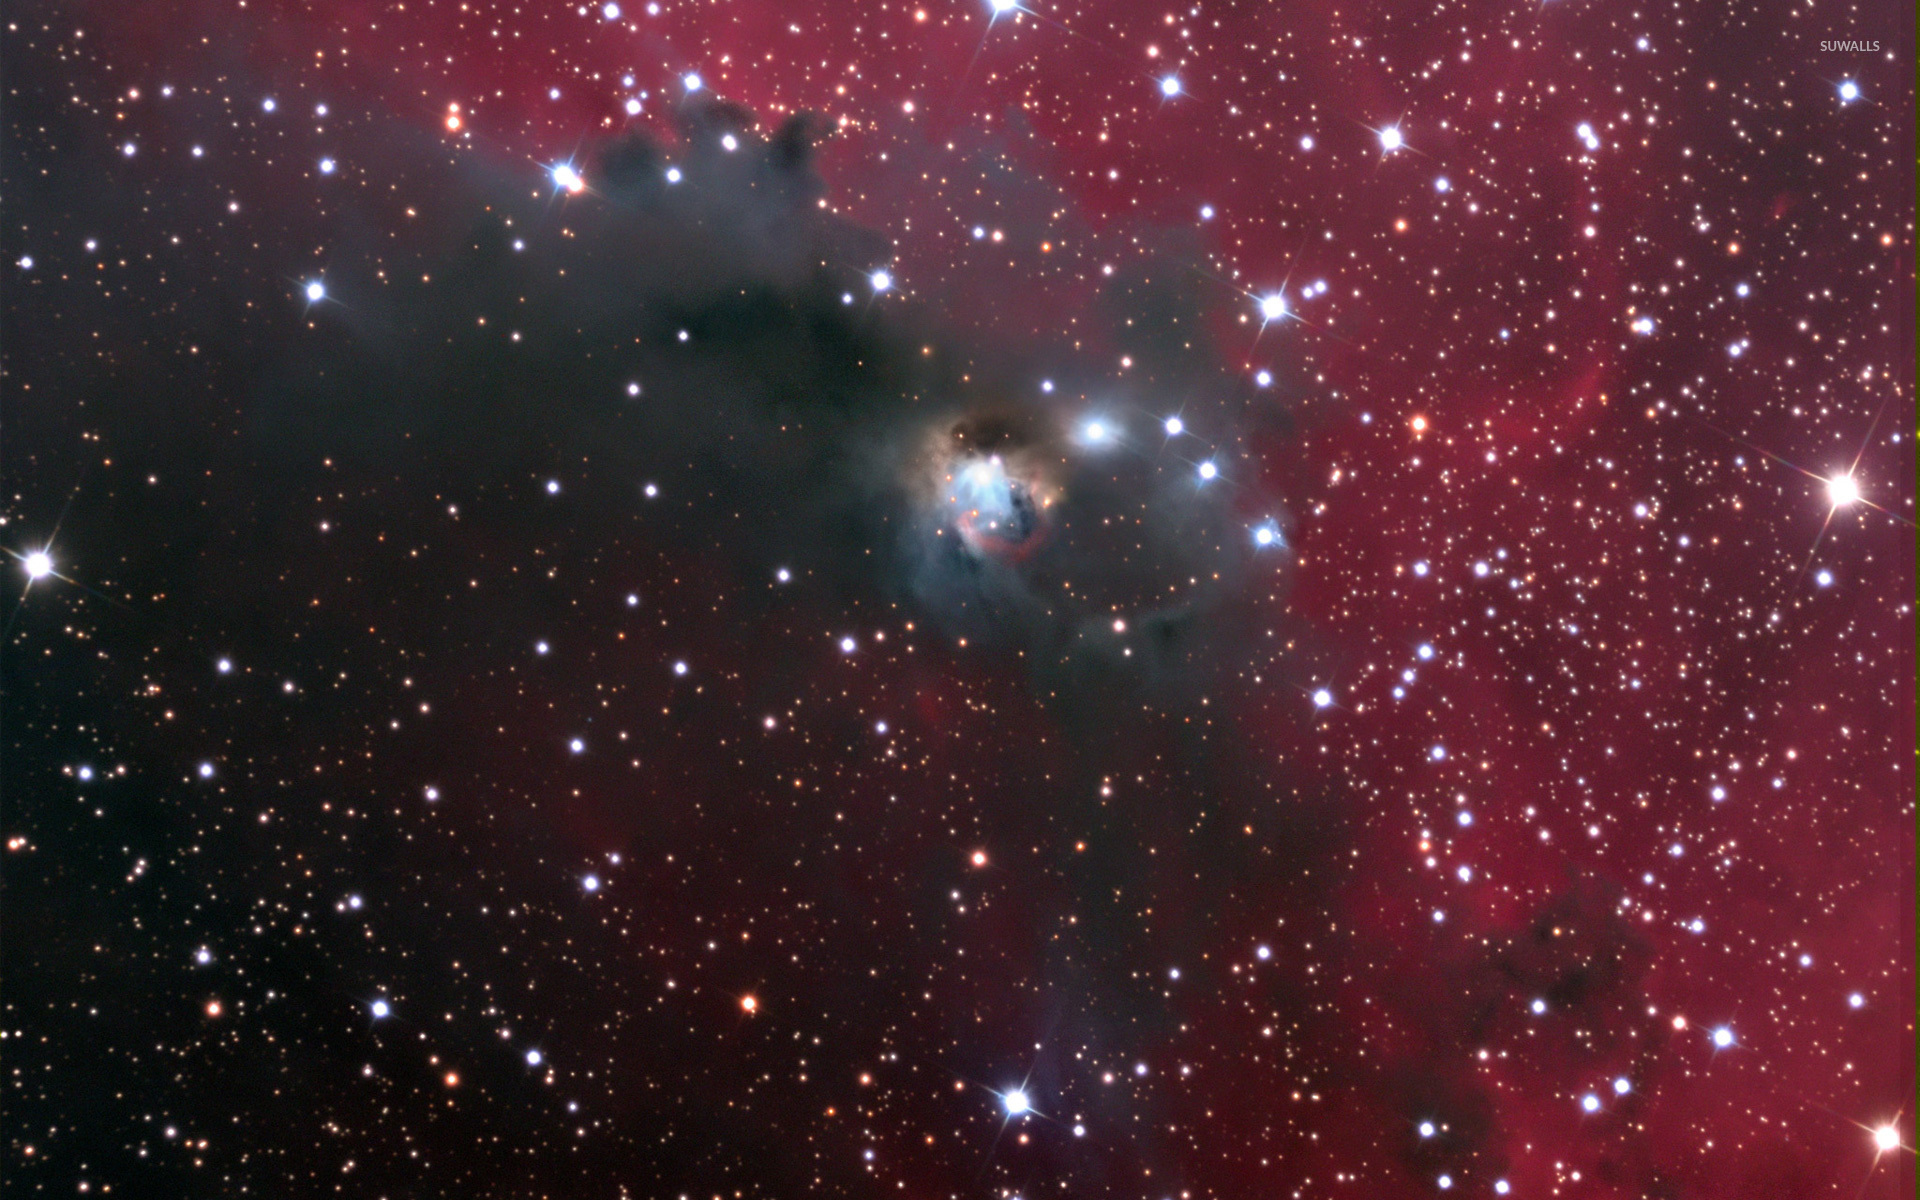 starcluster wallpaper - photo #6